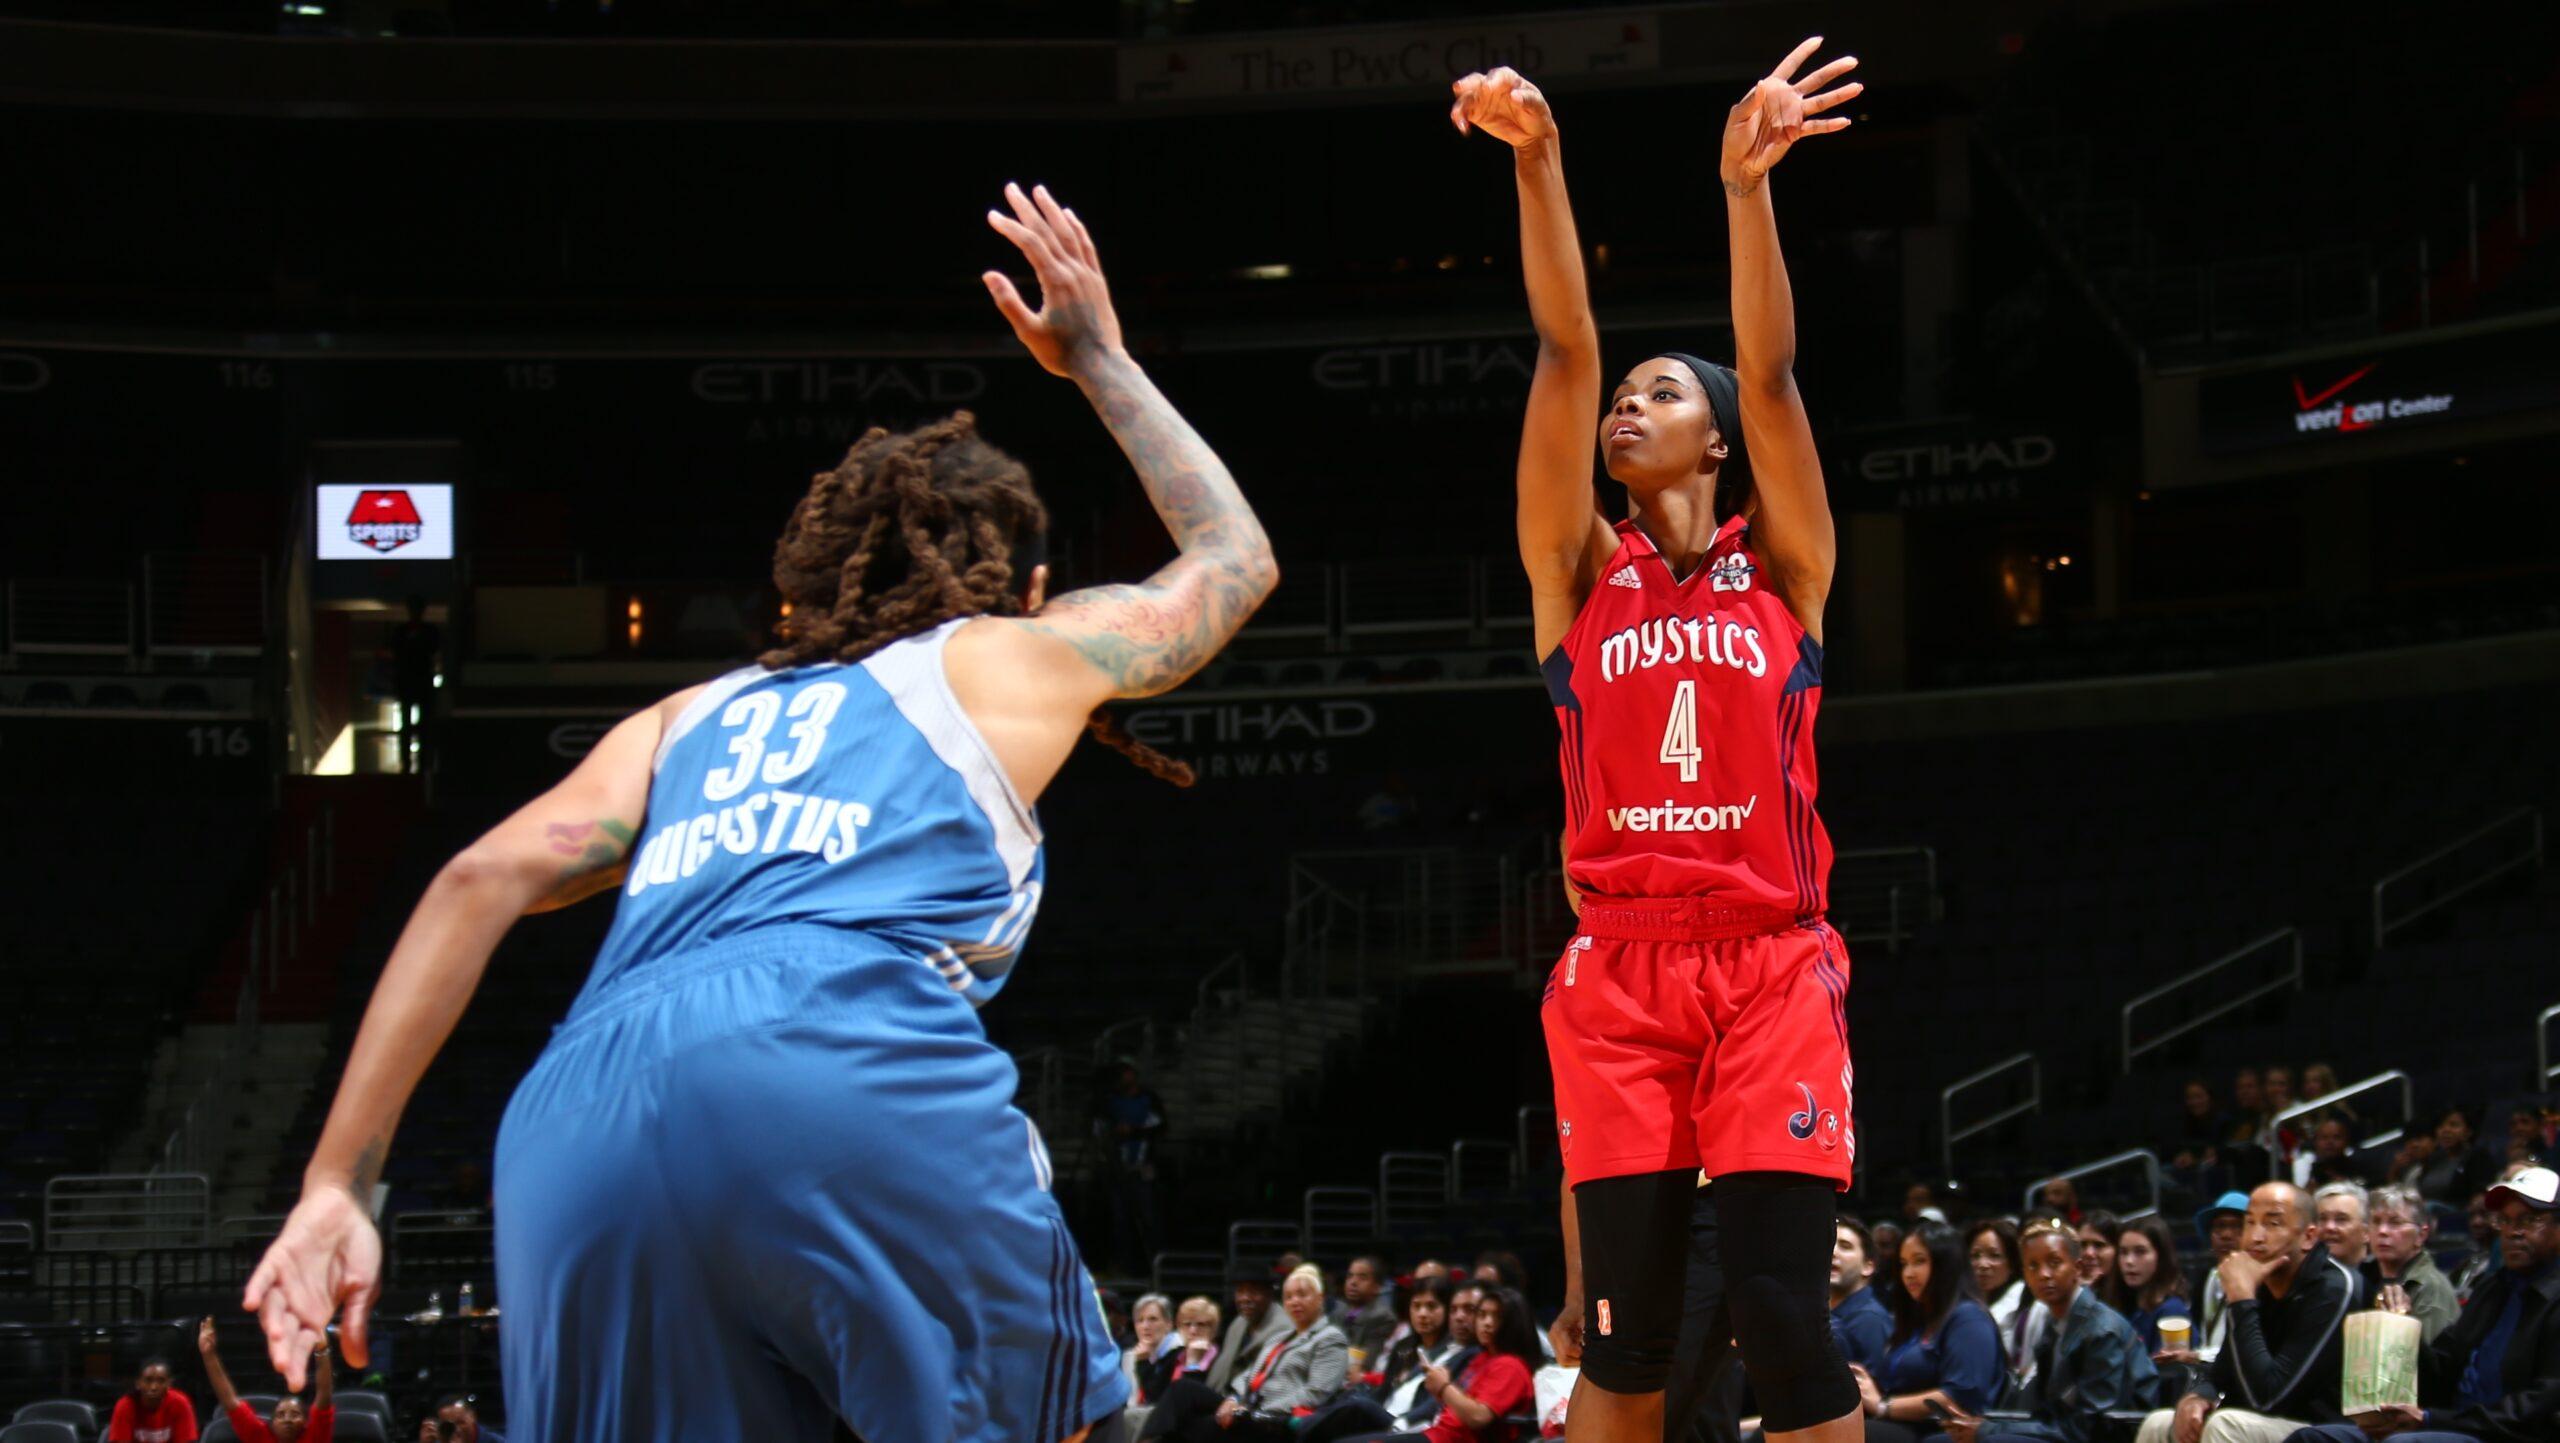 Washington Mystics face team chemistry challenge heading into the 2017 WNBA season